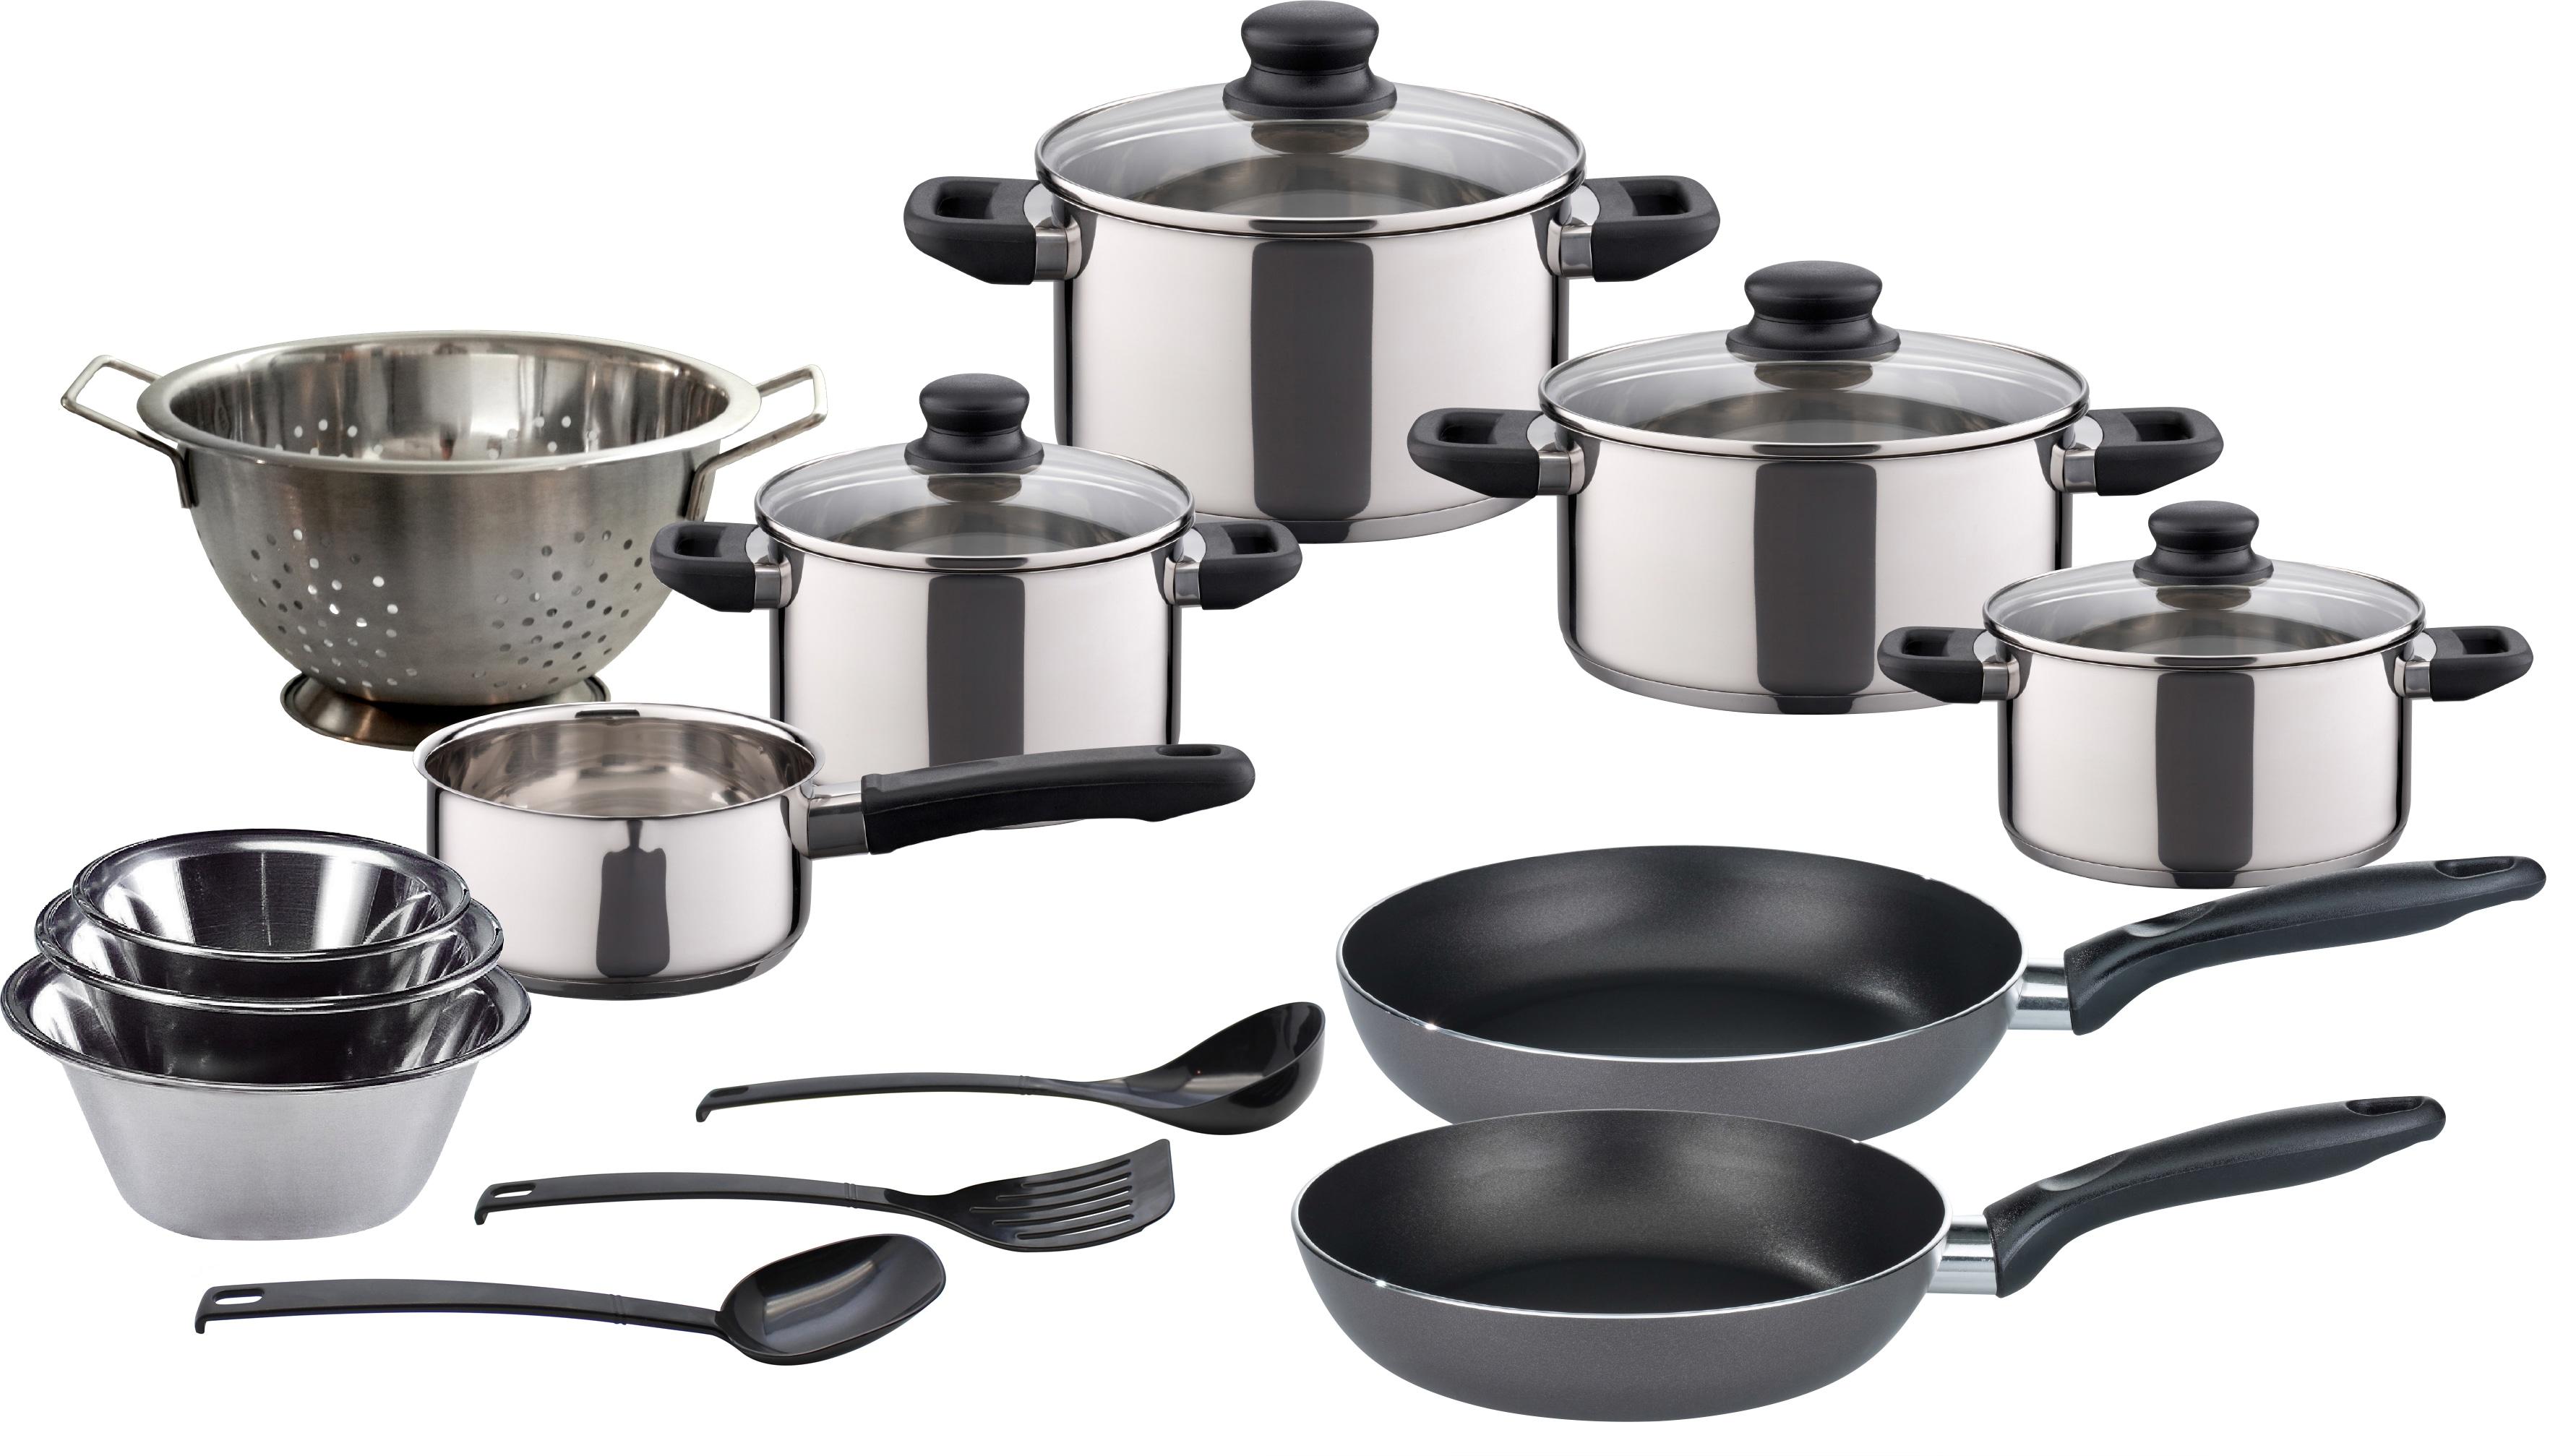 Elo - Meine Küche Topf-Set, Edelstahl, (Set, 18 tlg.) silberfarben Topf-Set Topfsets Töpfe Haushaltswaren